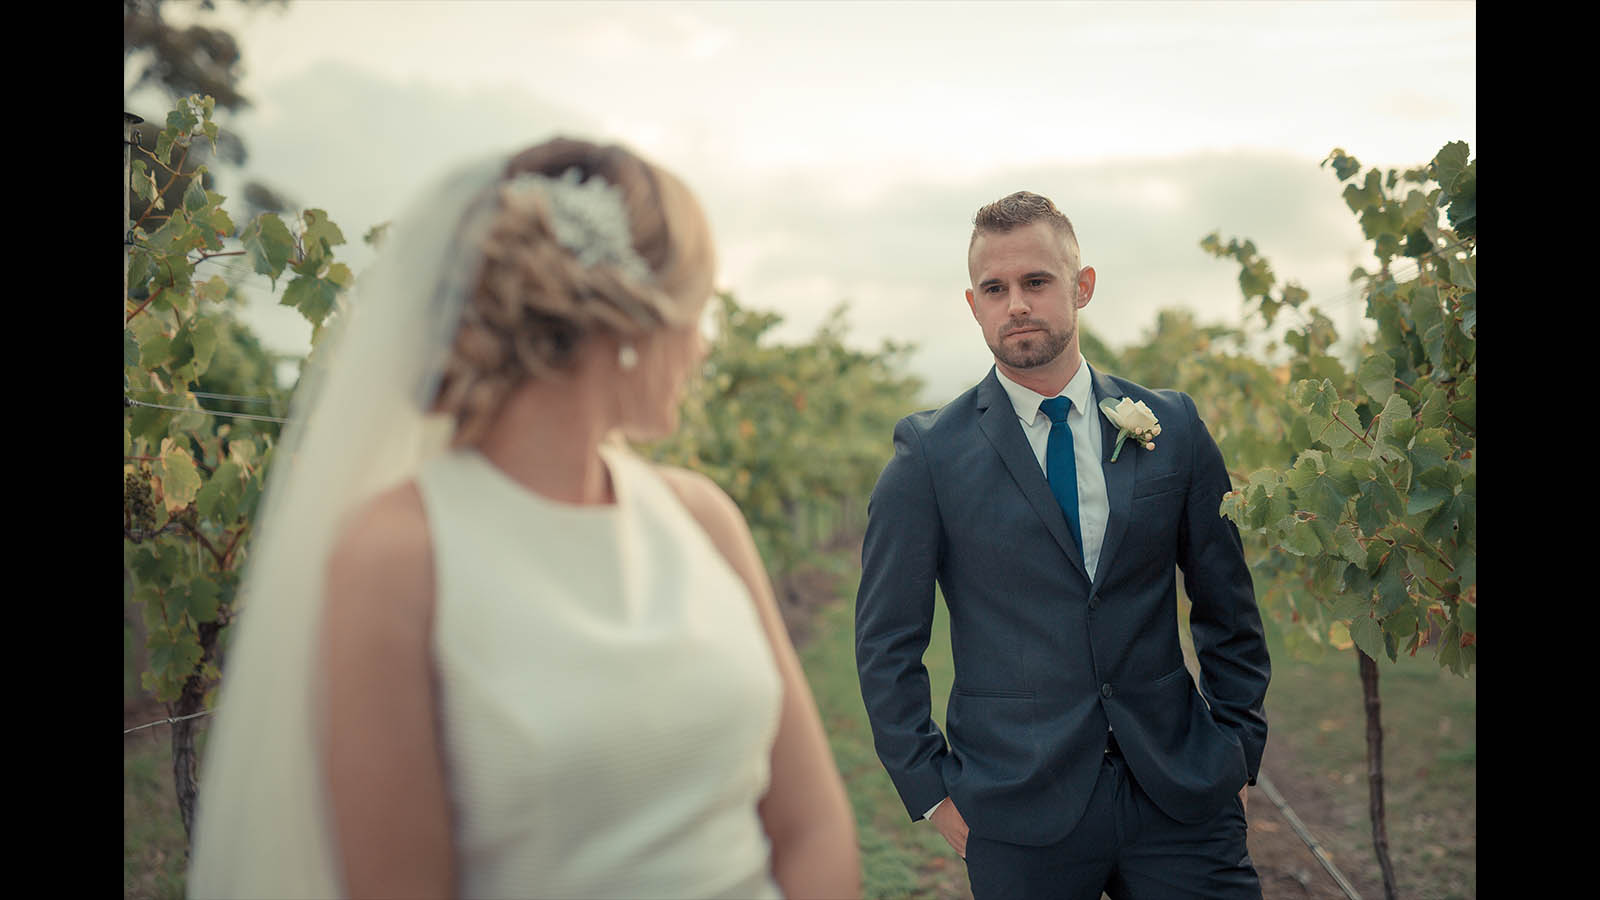 Melbourne-wedding-photography 53